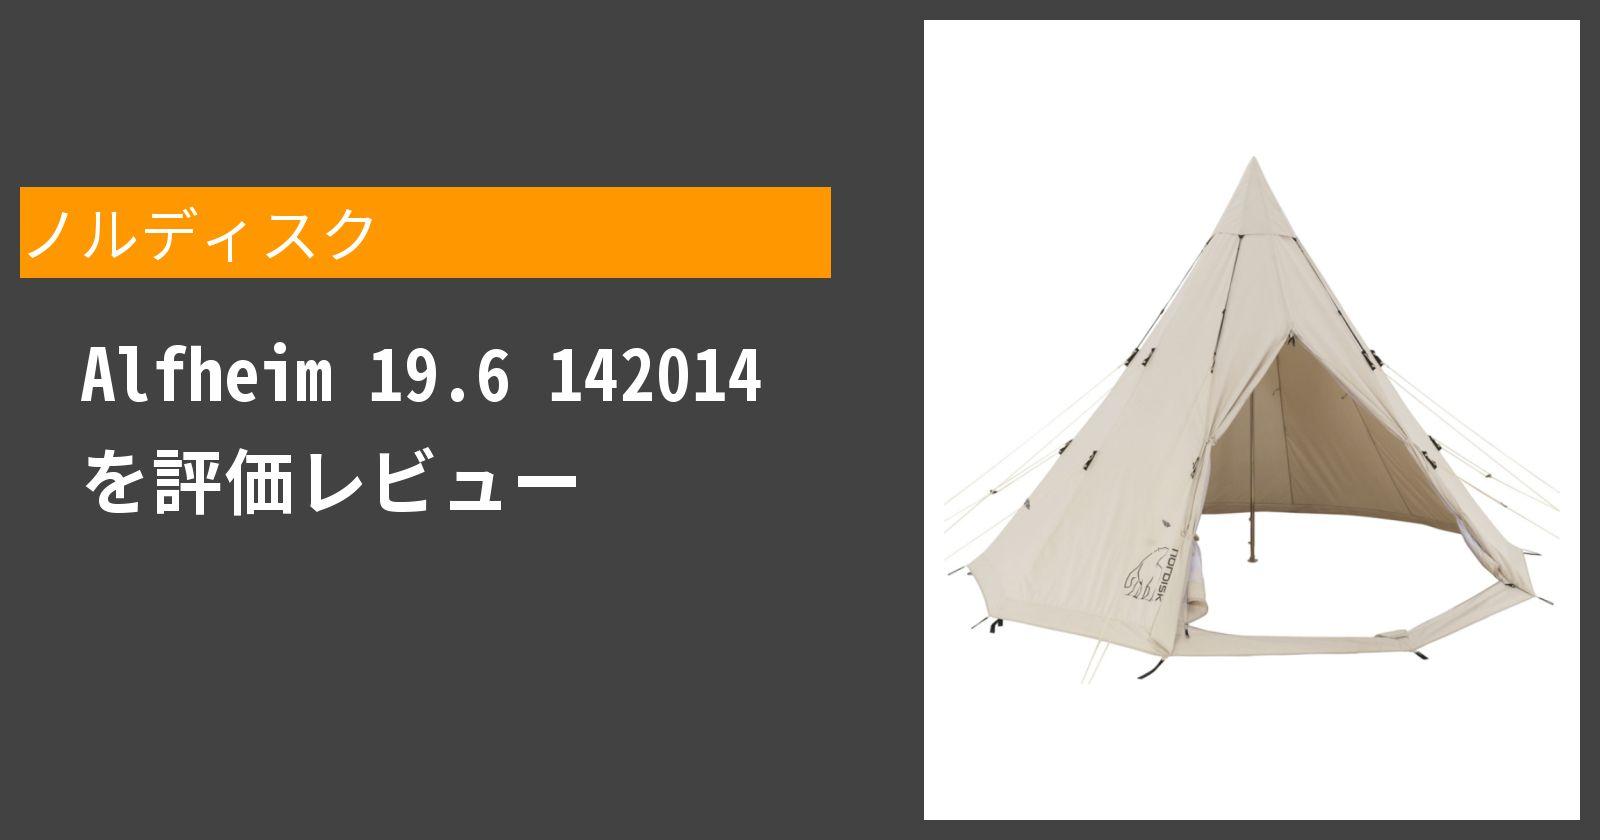 Alfheim 19.6 142014を徹底評価